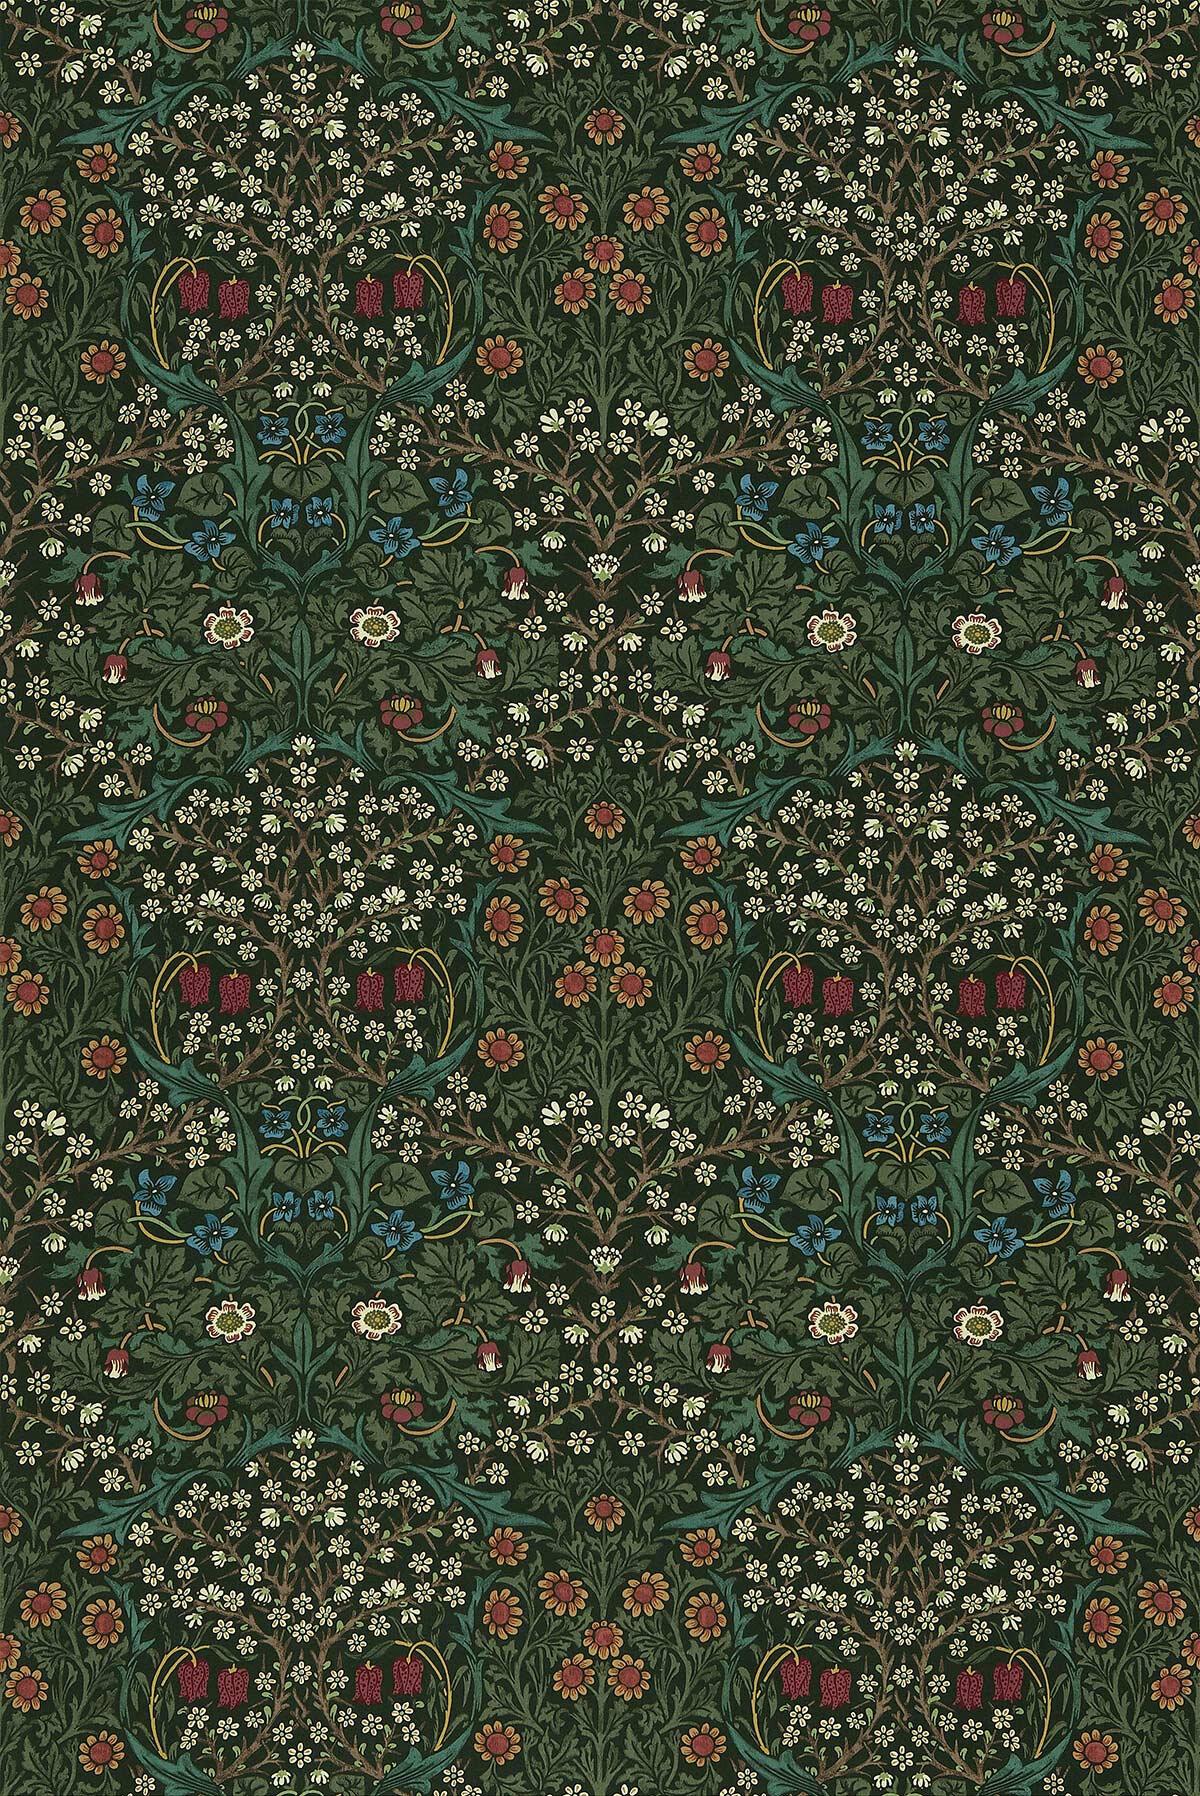 Morris Fabric Blackthorn 226707